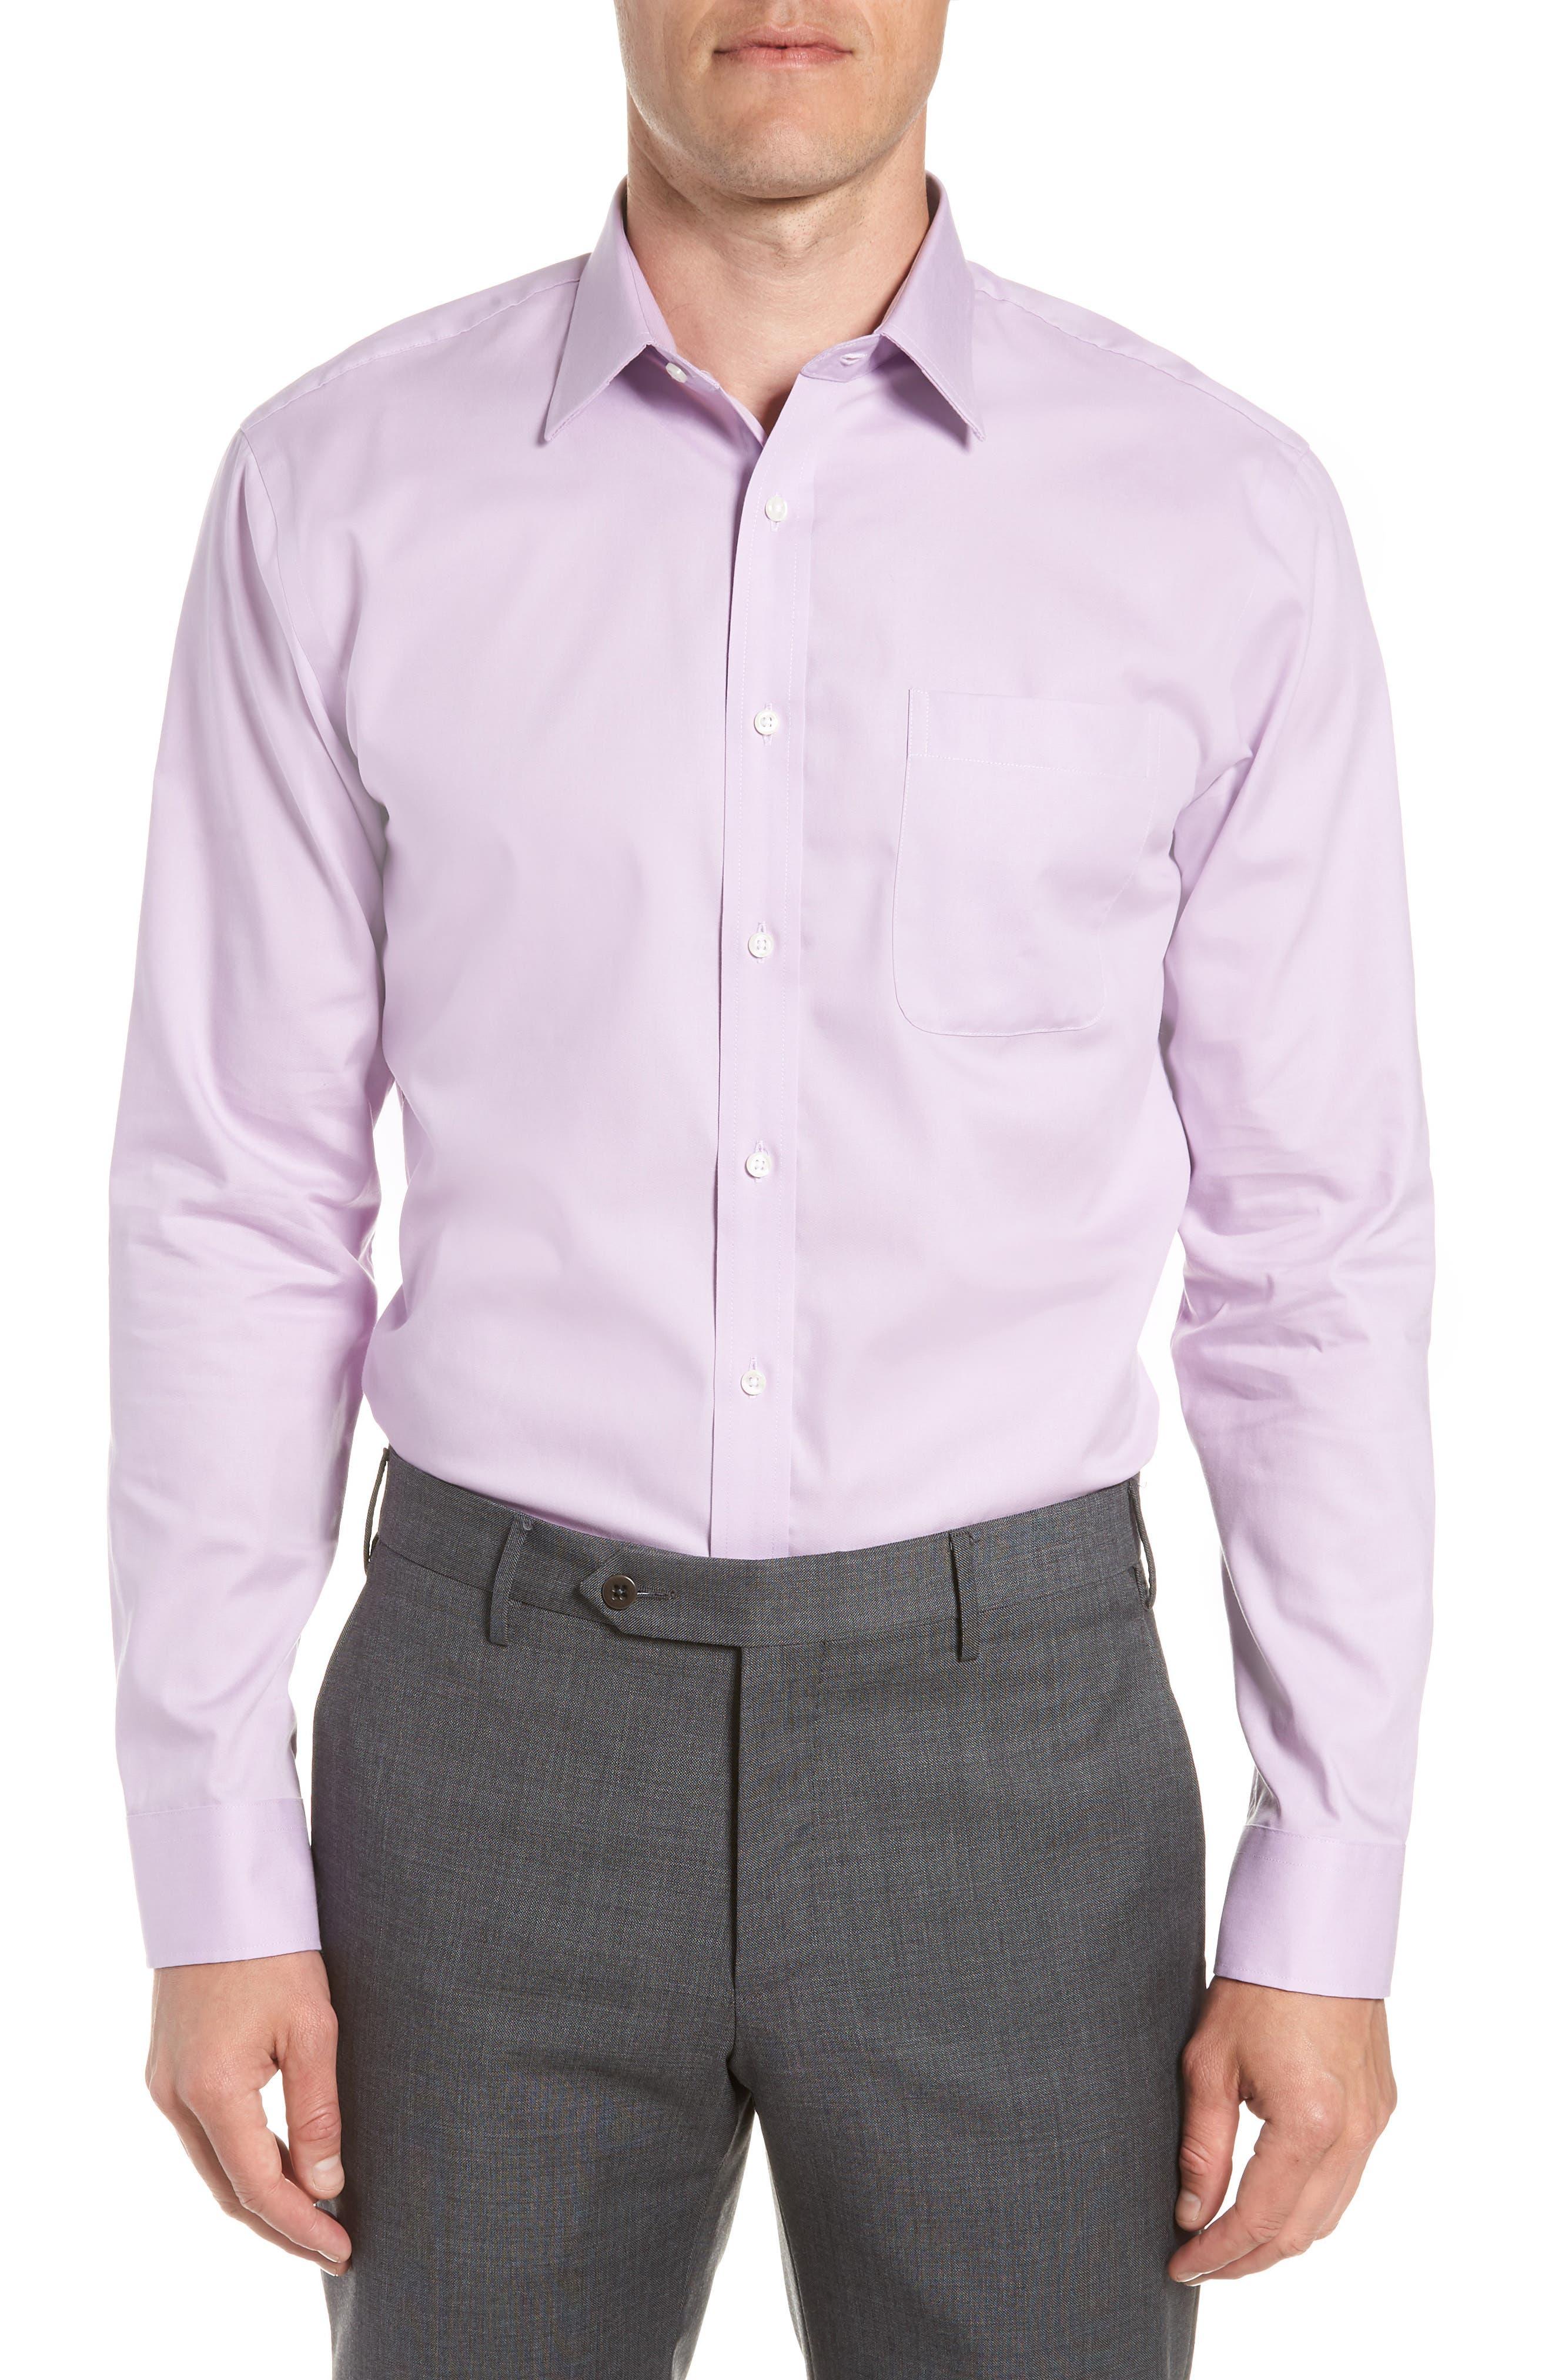 Men's Dress Shirt Dresses